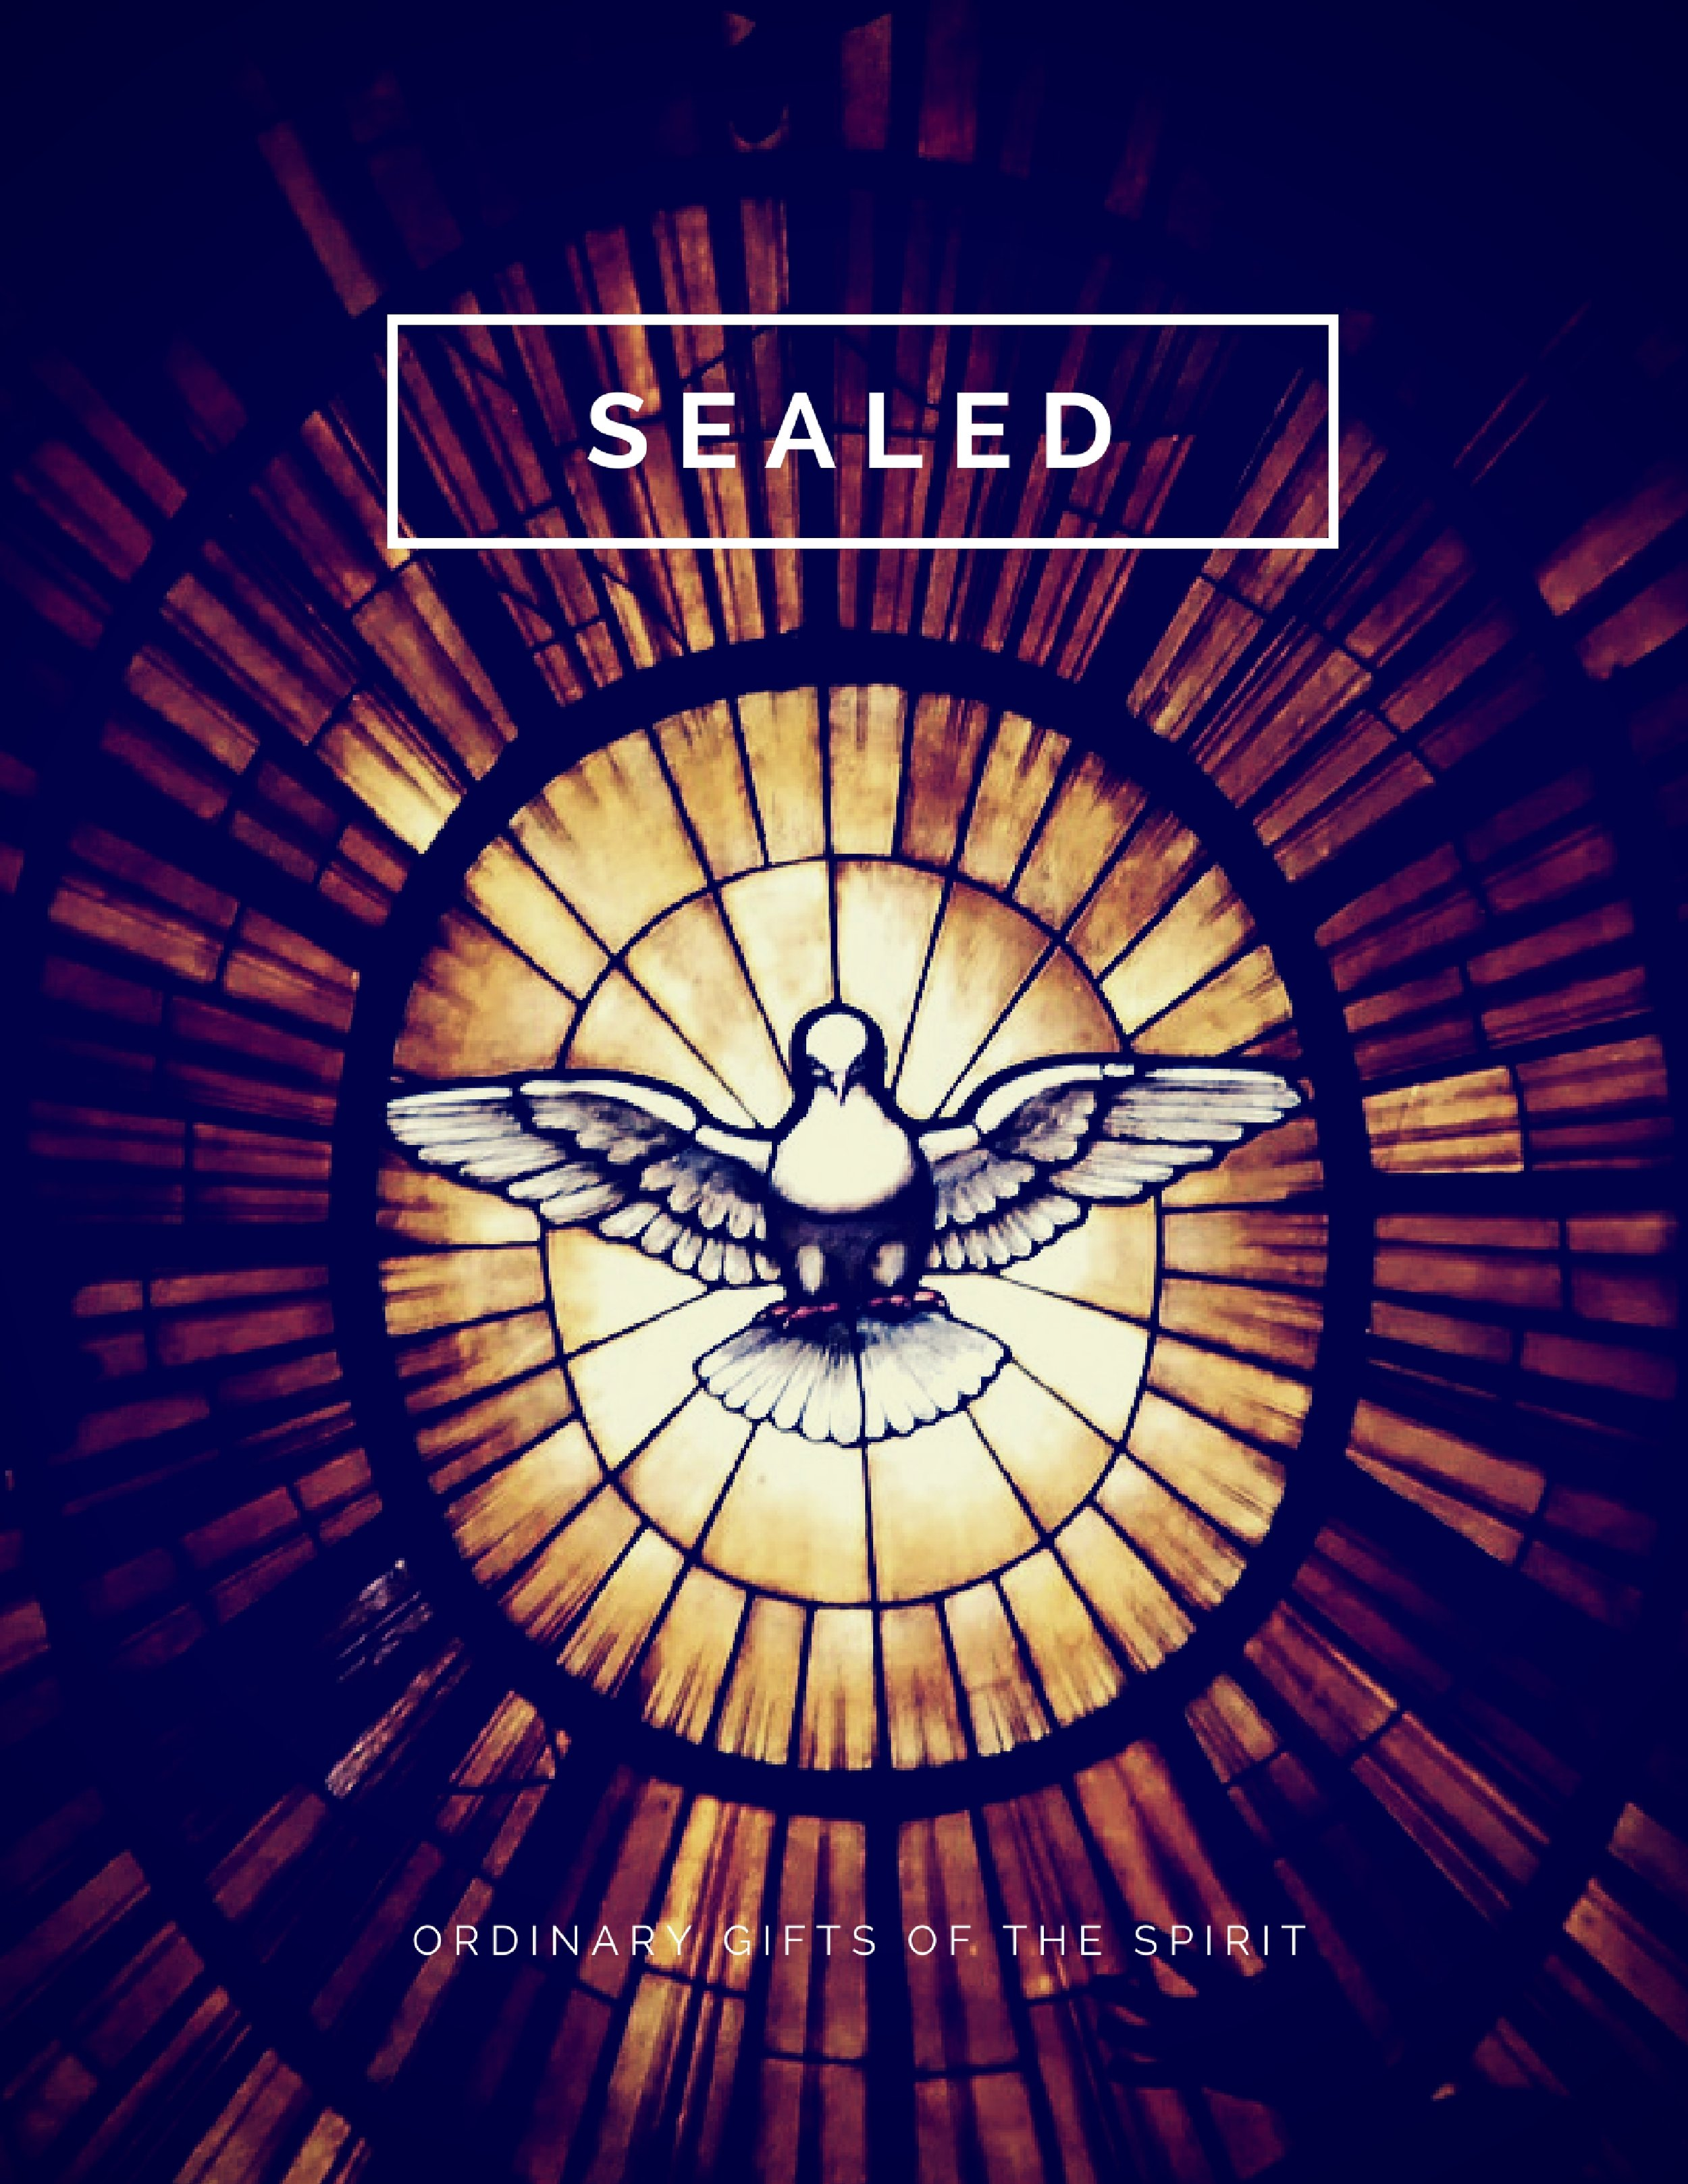 Sealedwith the spirit1.jpg